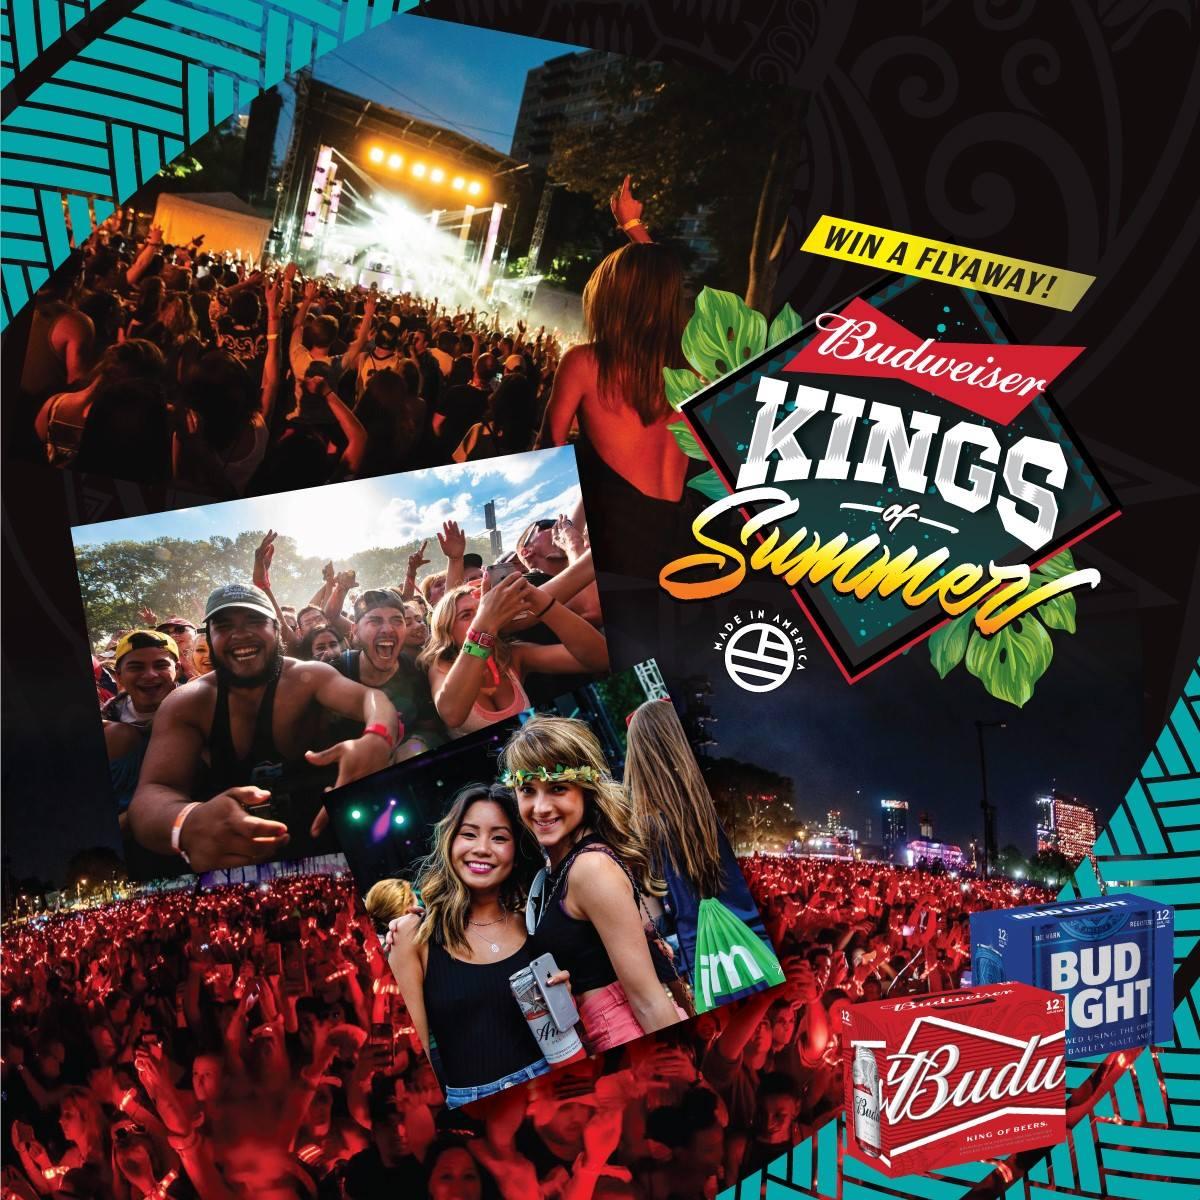 Budweiser Kings of Summer